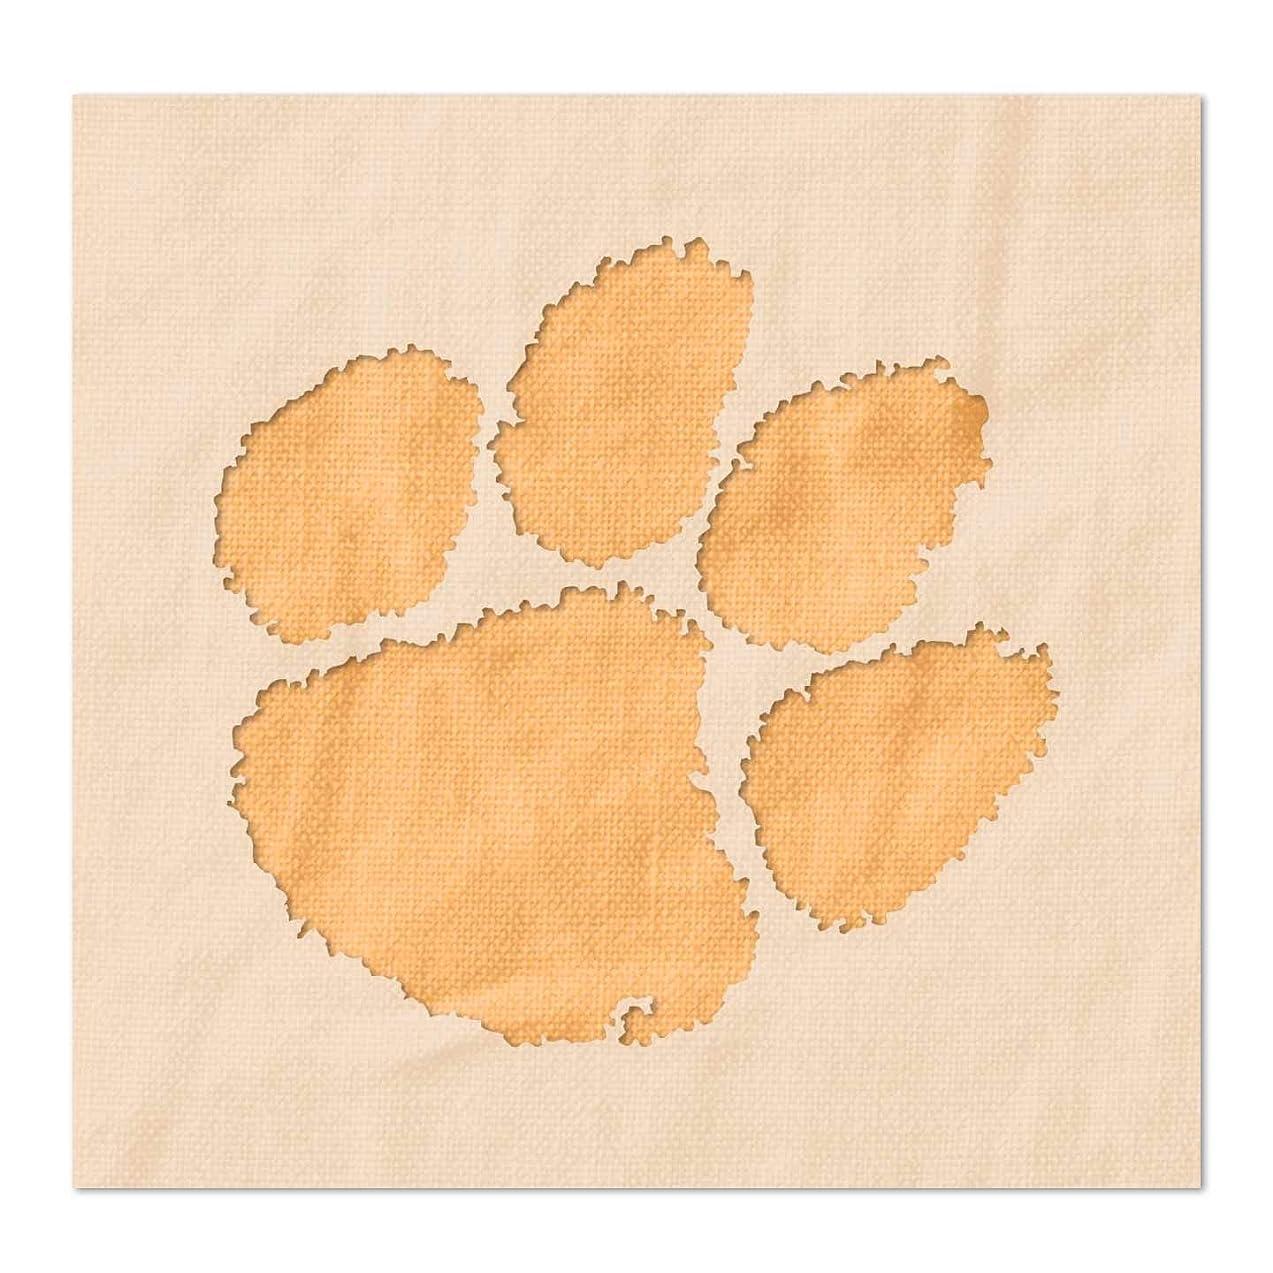 Clemson Tigers Paw Logo Stencil - Reusable 14 Mil Mylar Plastic (4 x 3.85 inches)